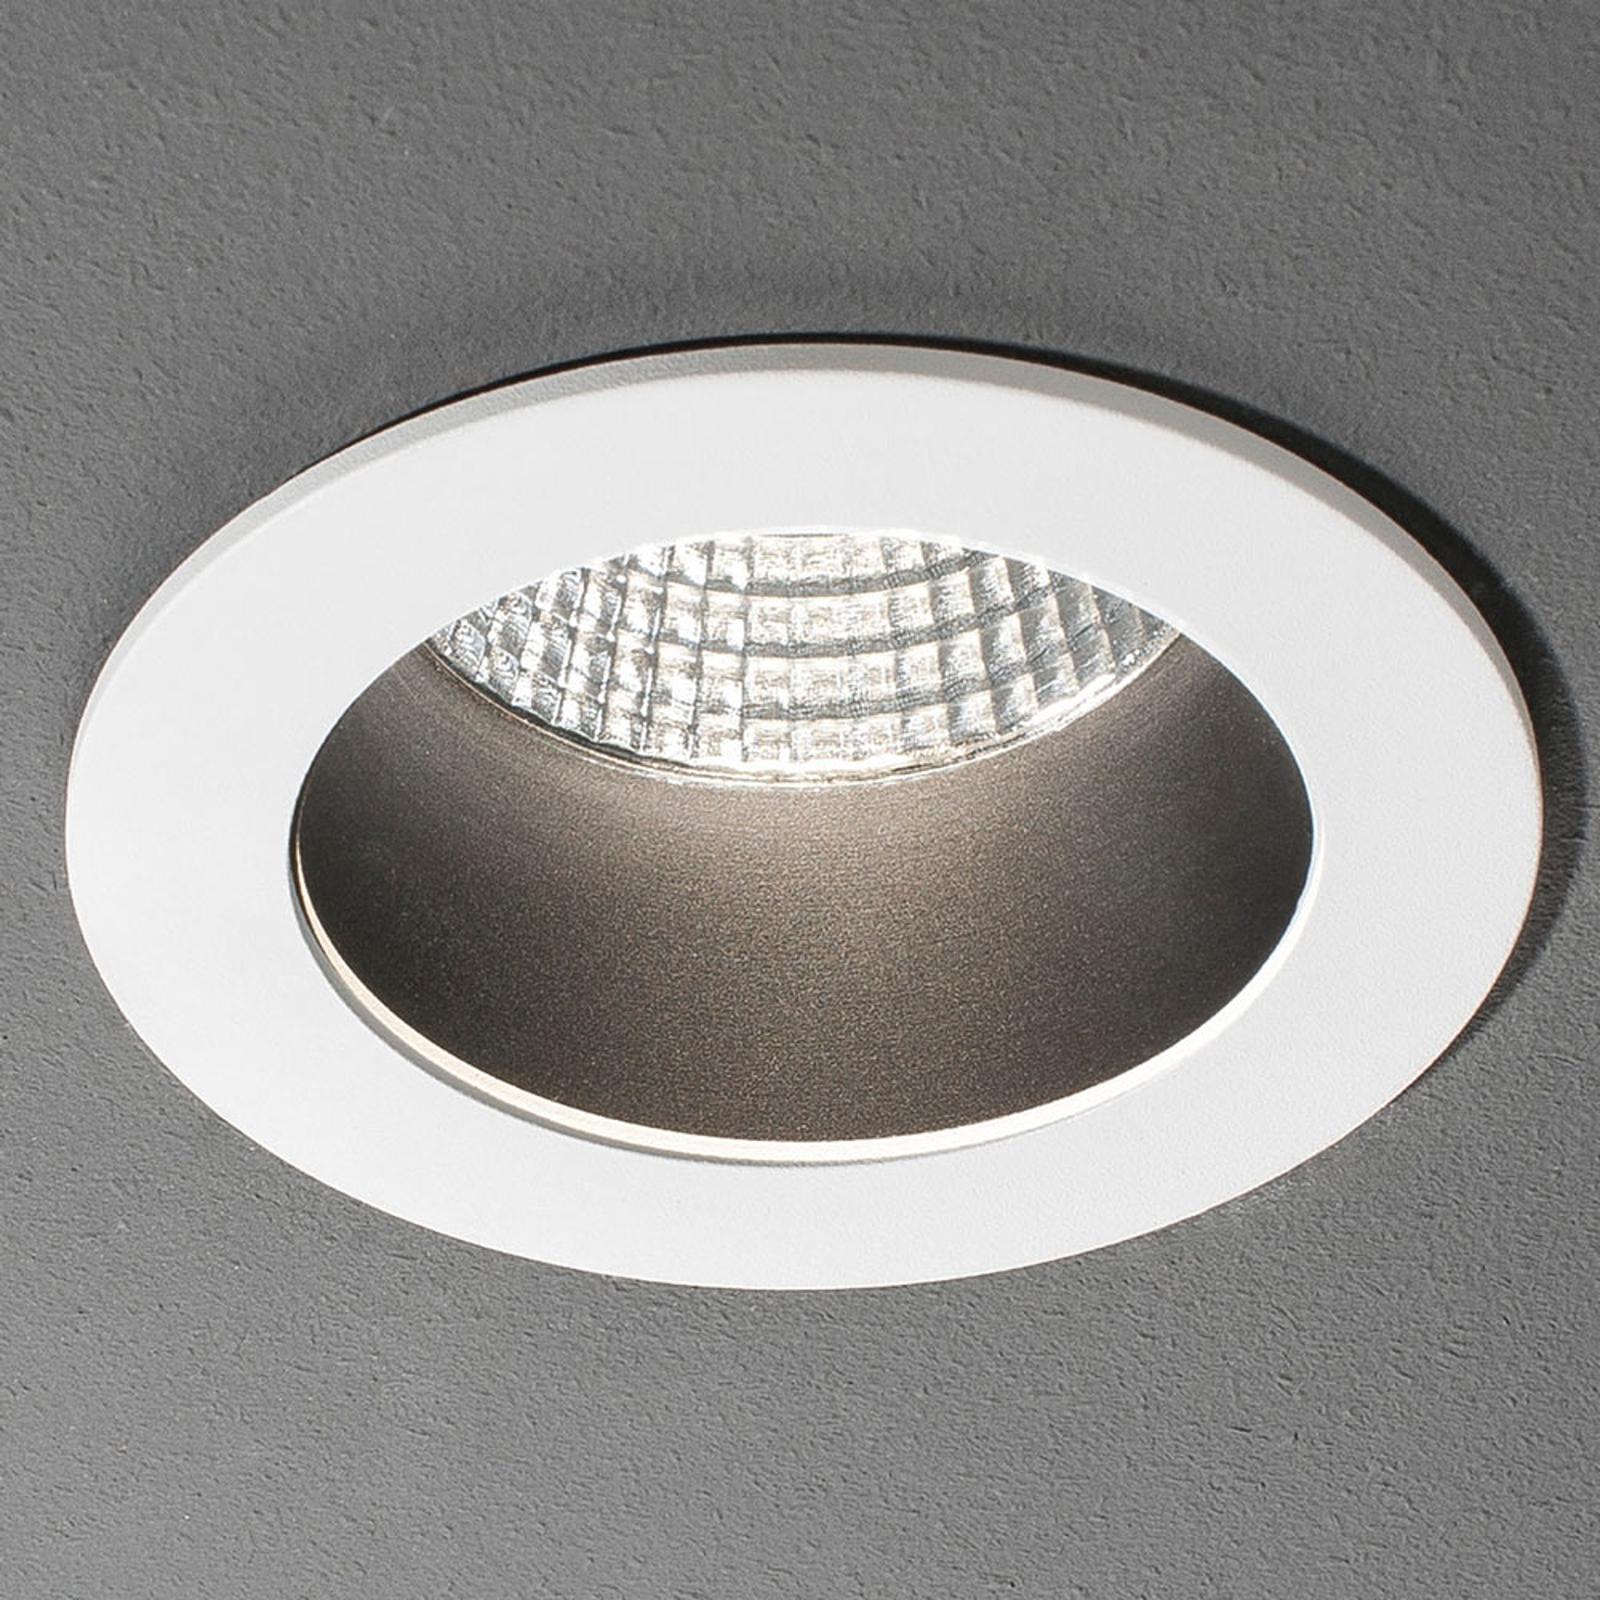 LED inbouwspot look Round Big, wit